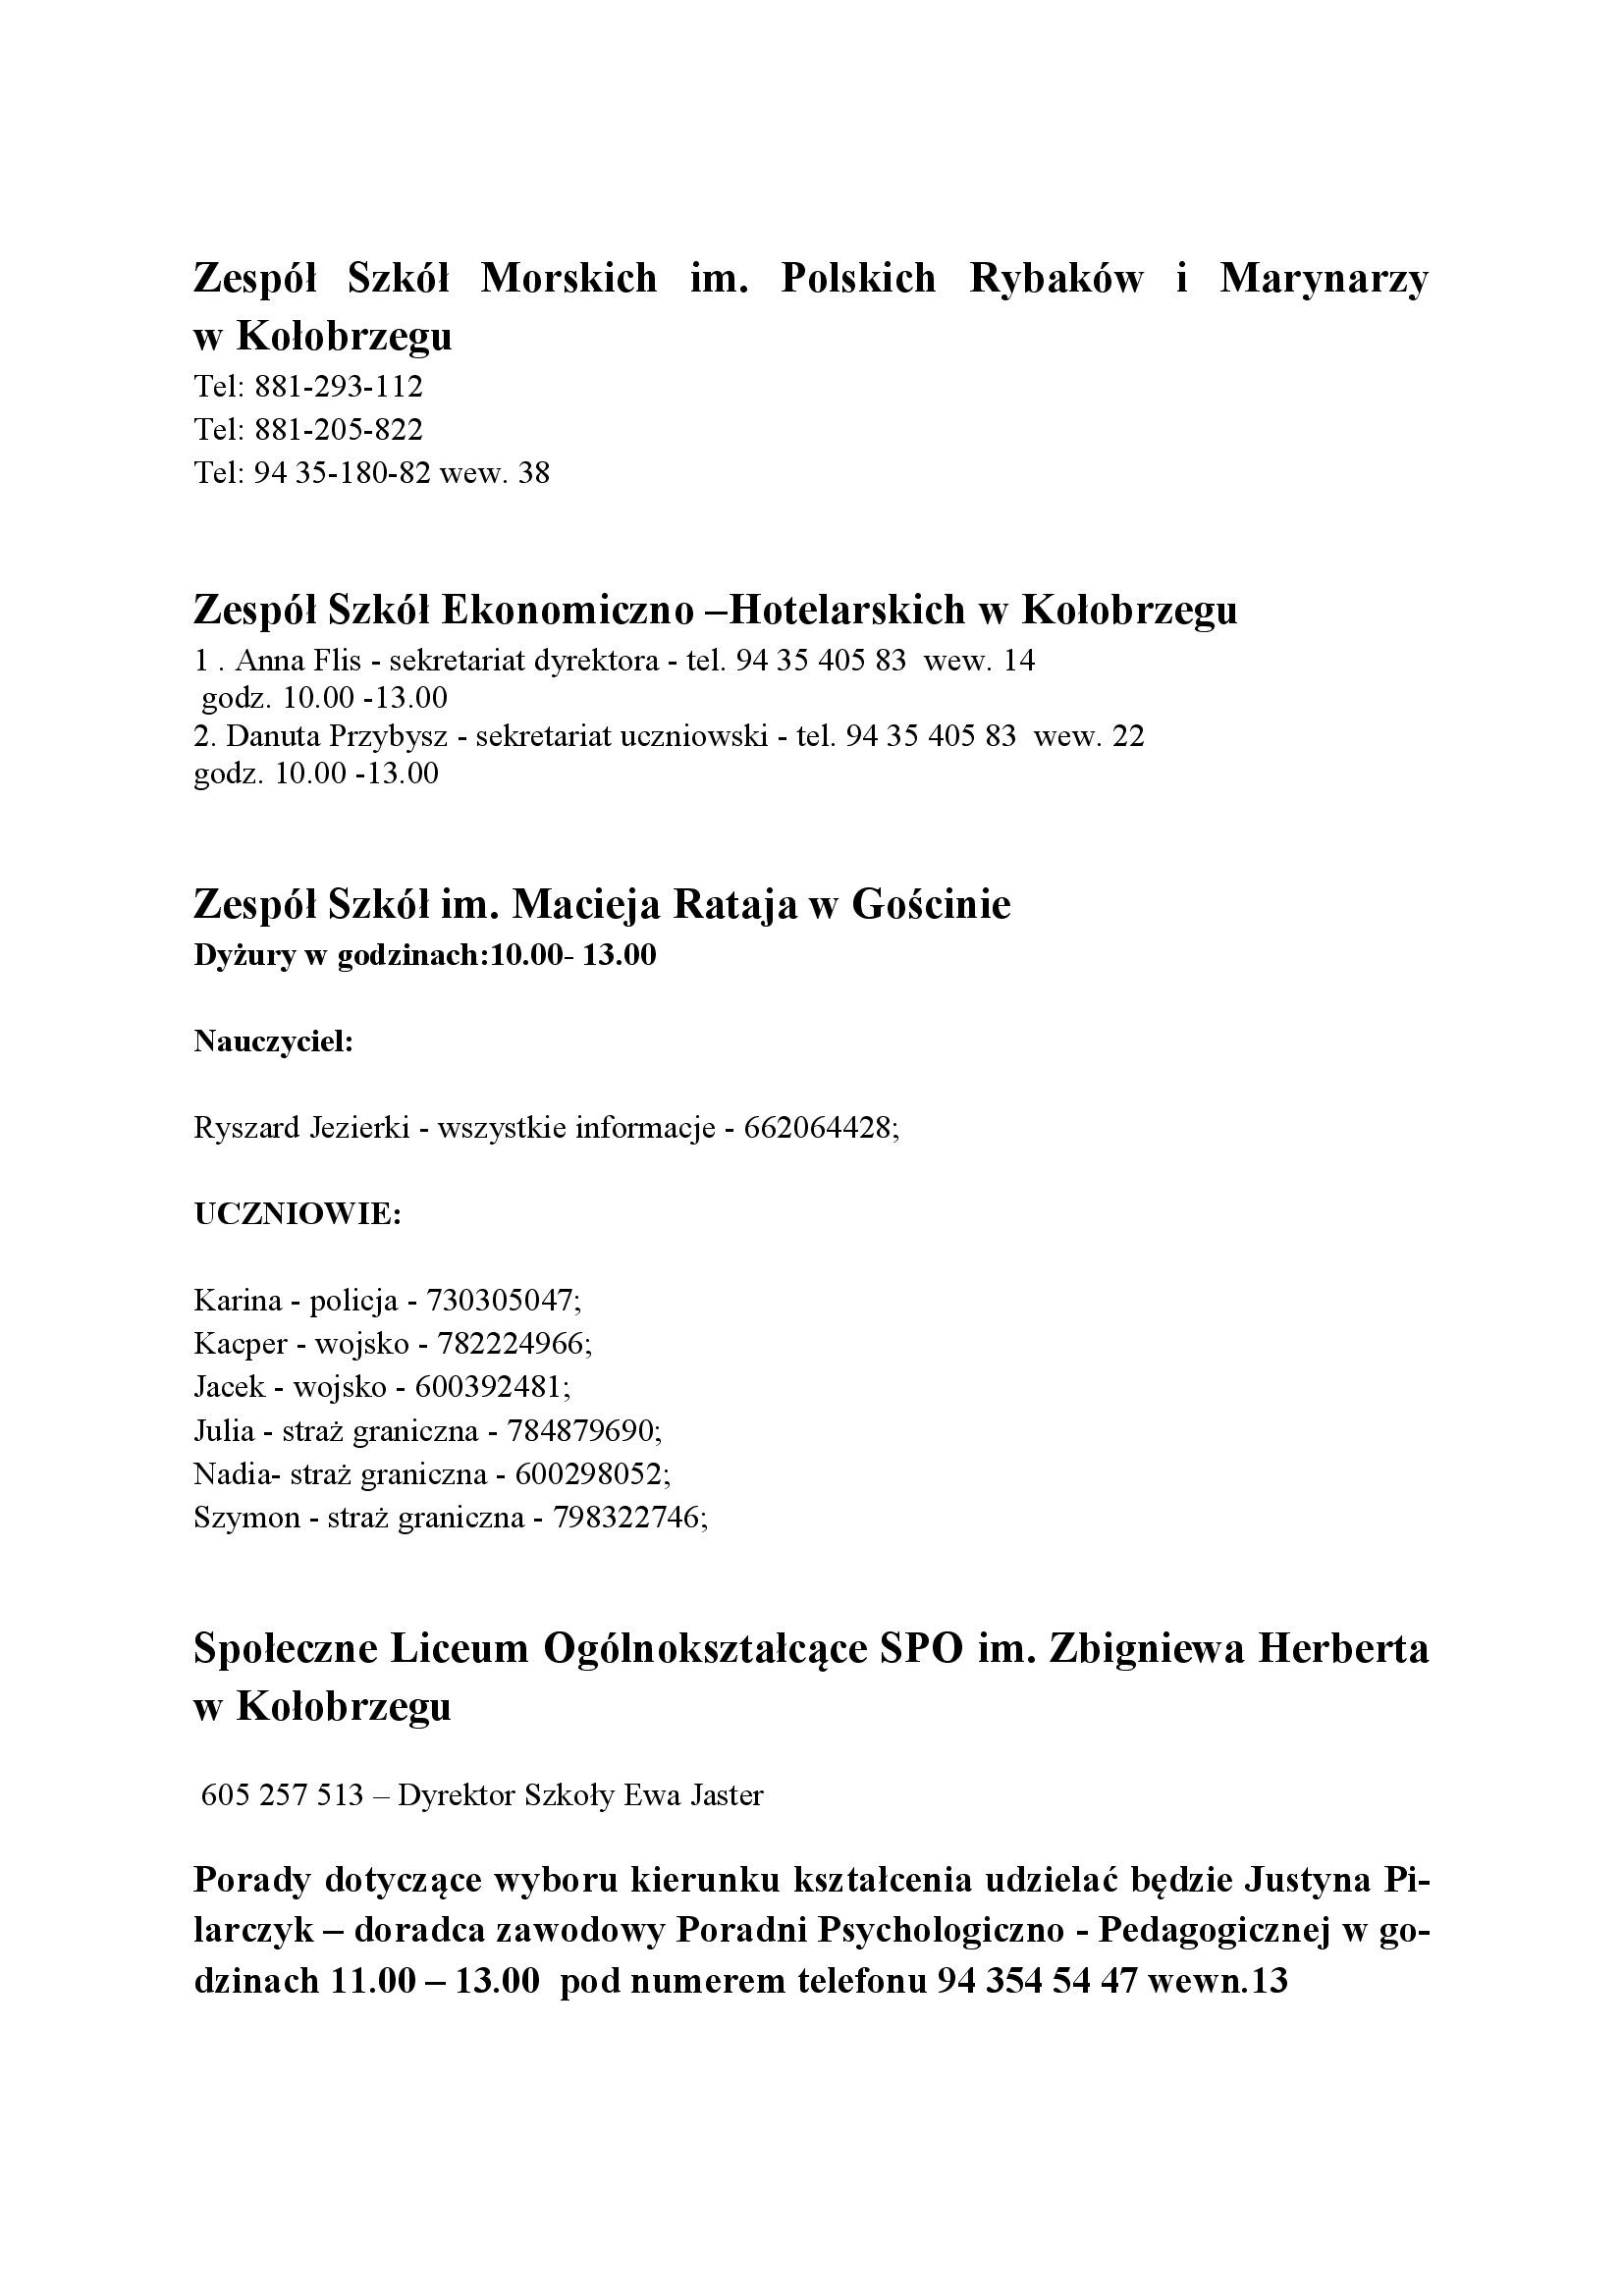 Targi Edukacyjne 2020(2)-002